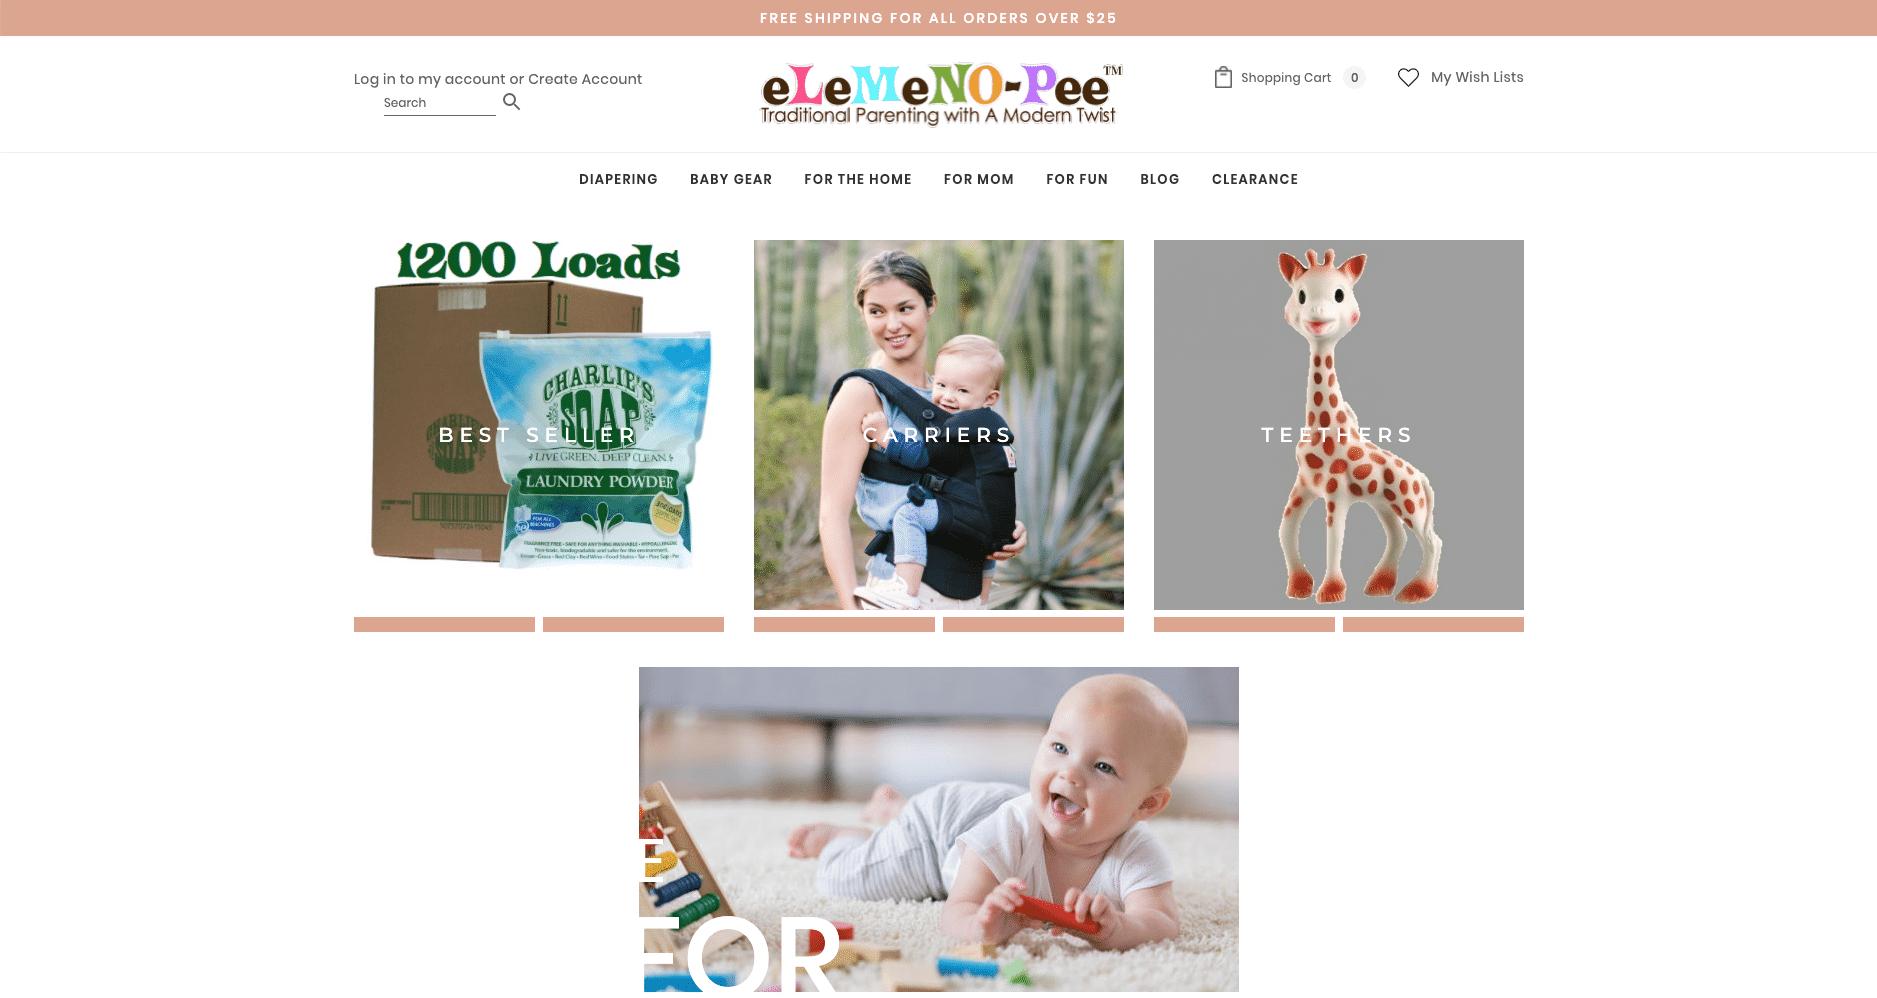 eLeMeNO-Pee, moderne Elternprodukte